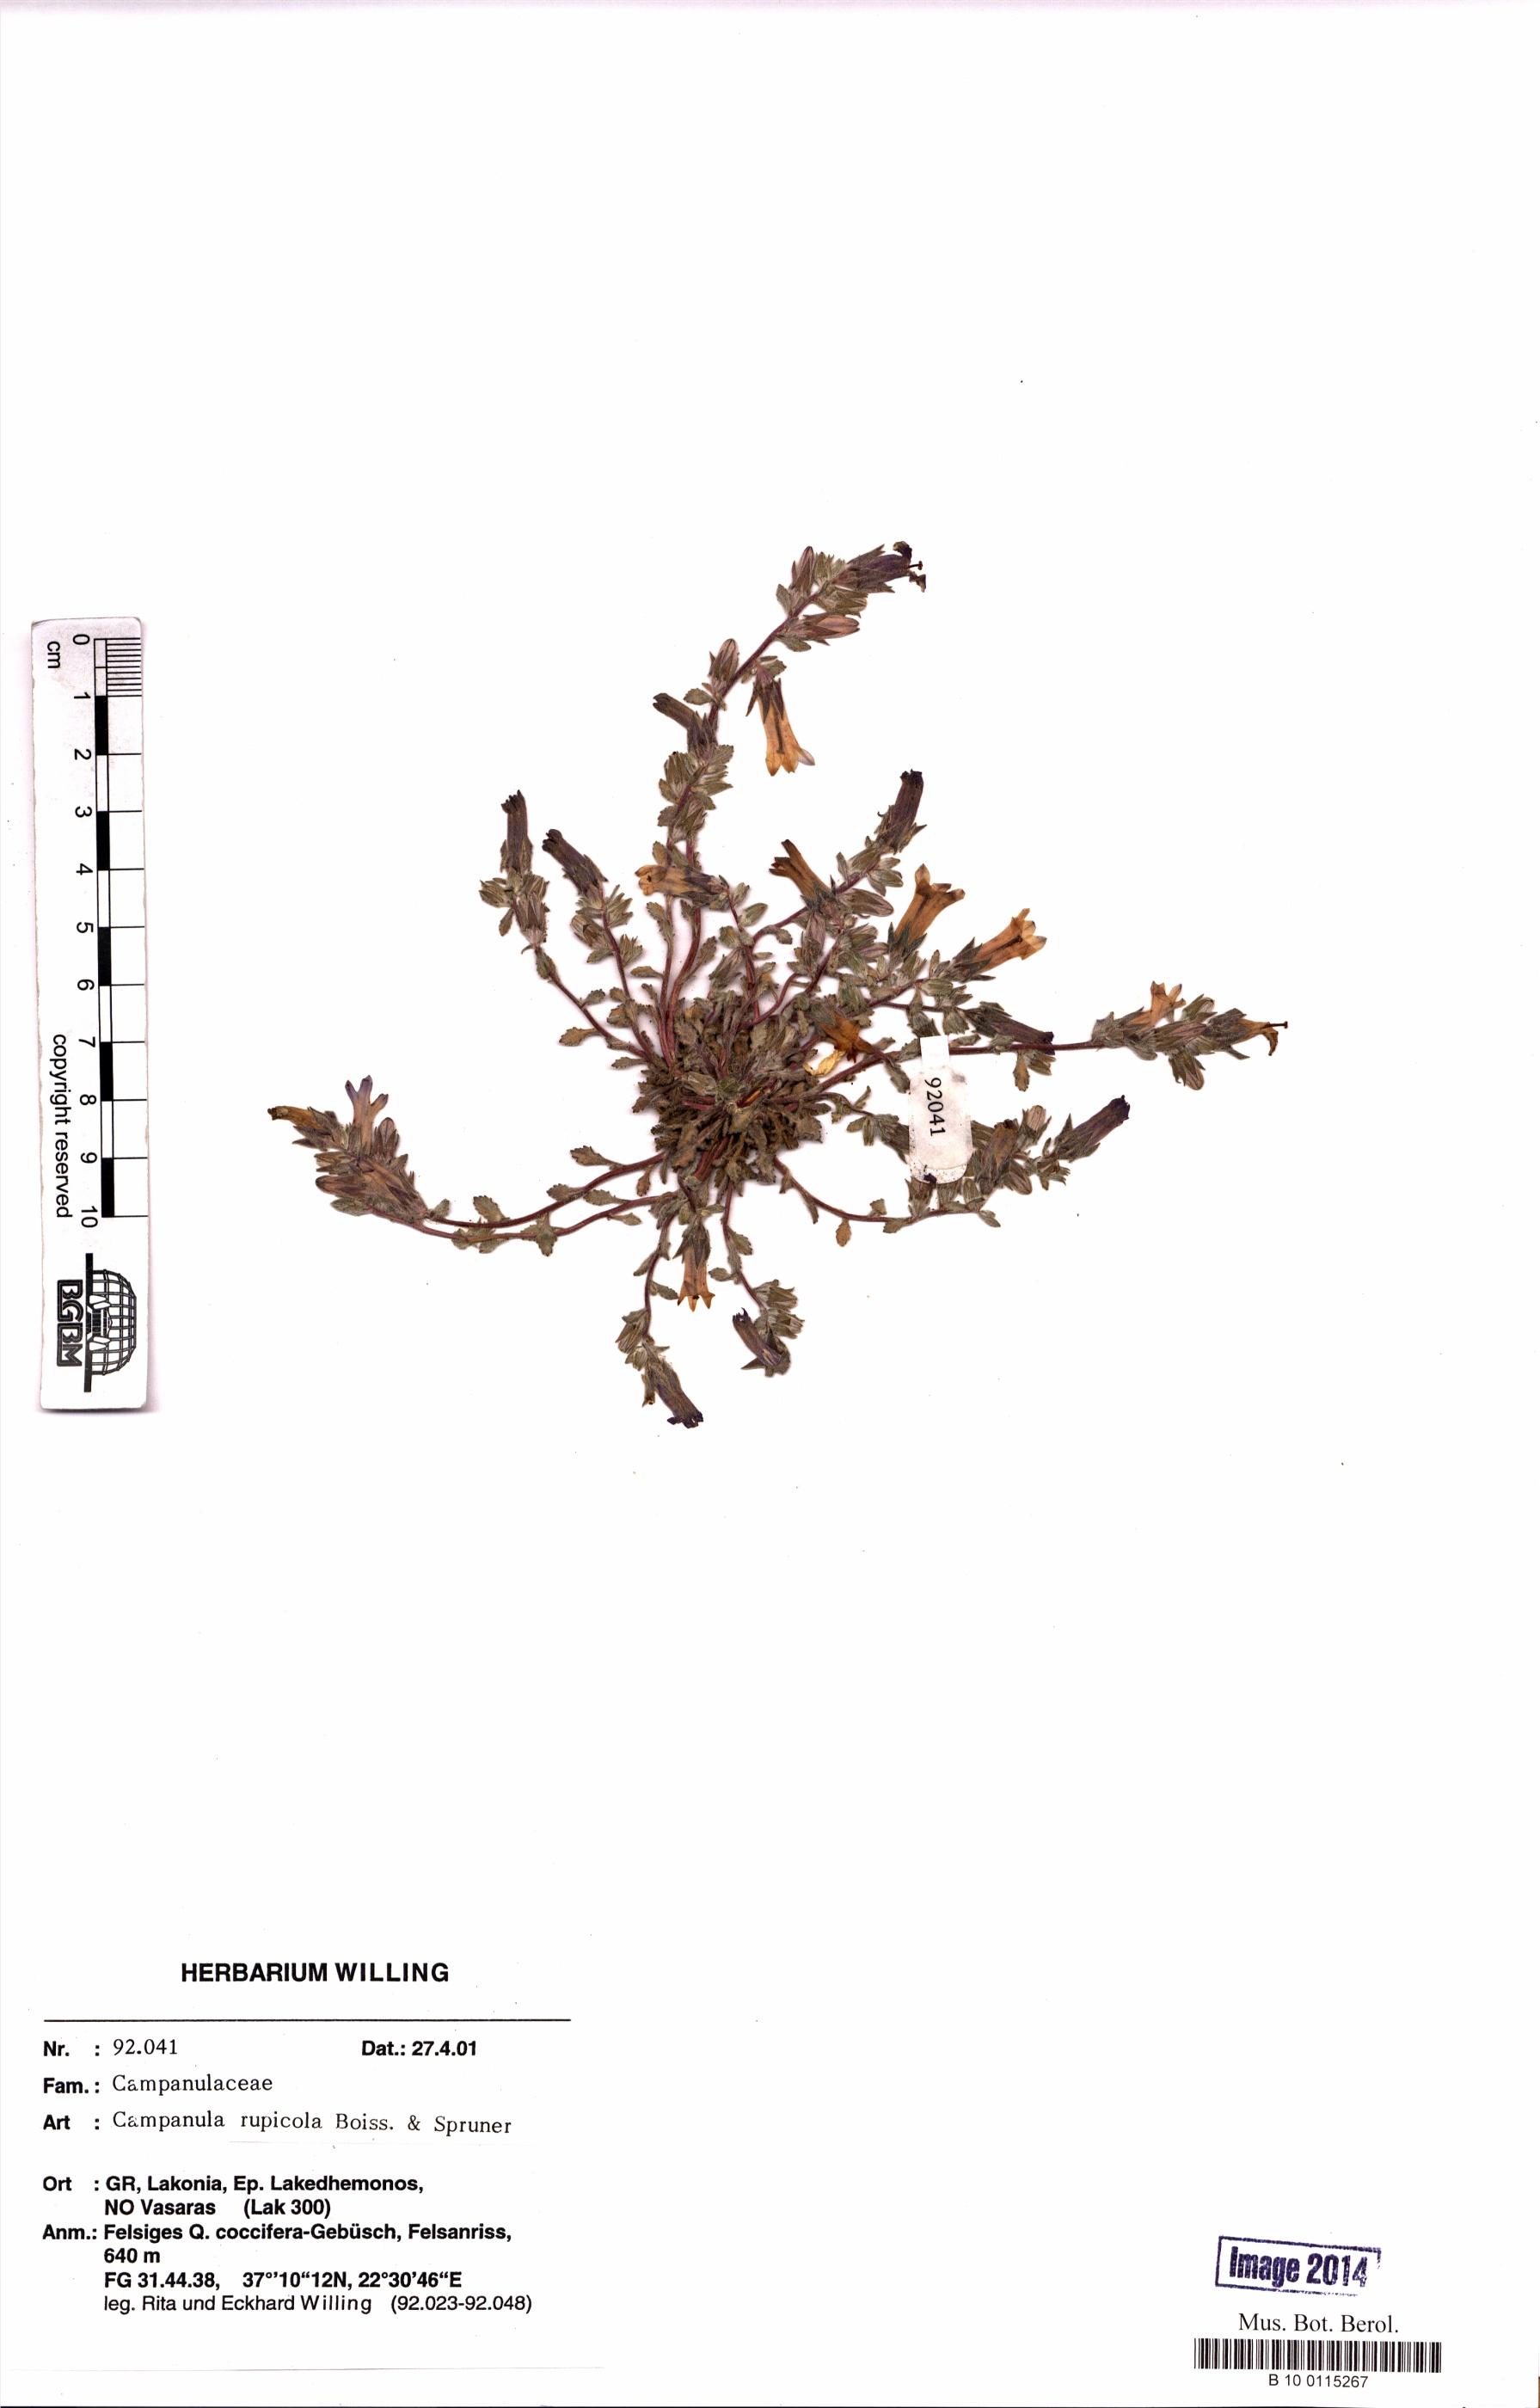 http://ww2.bgbm.org/herbarium/images/B/10/01/15/26/B_10_0115267.jpg